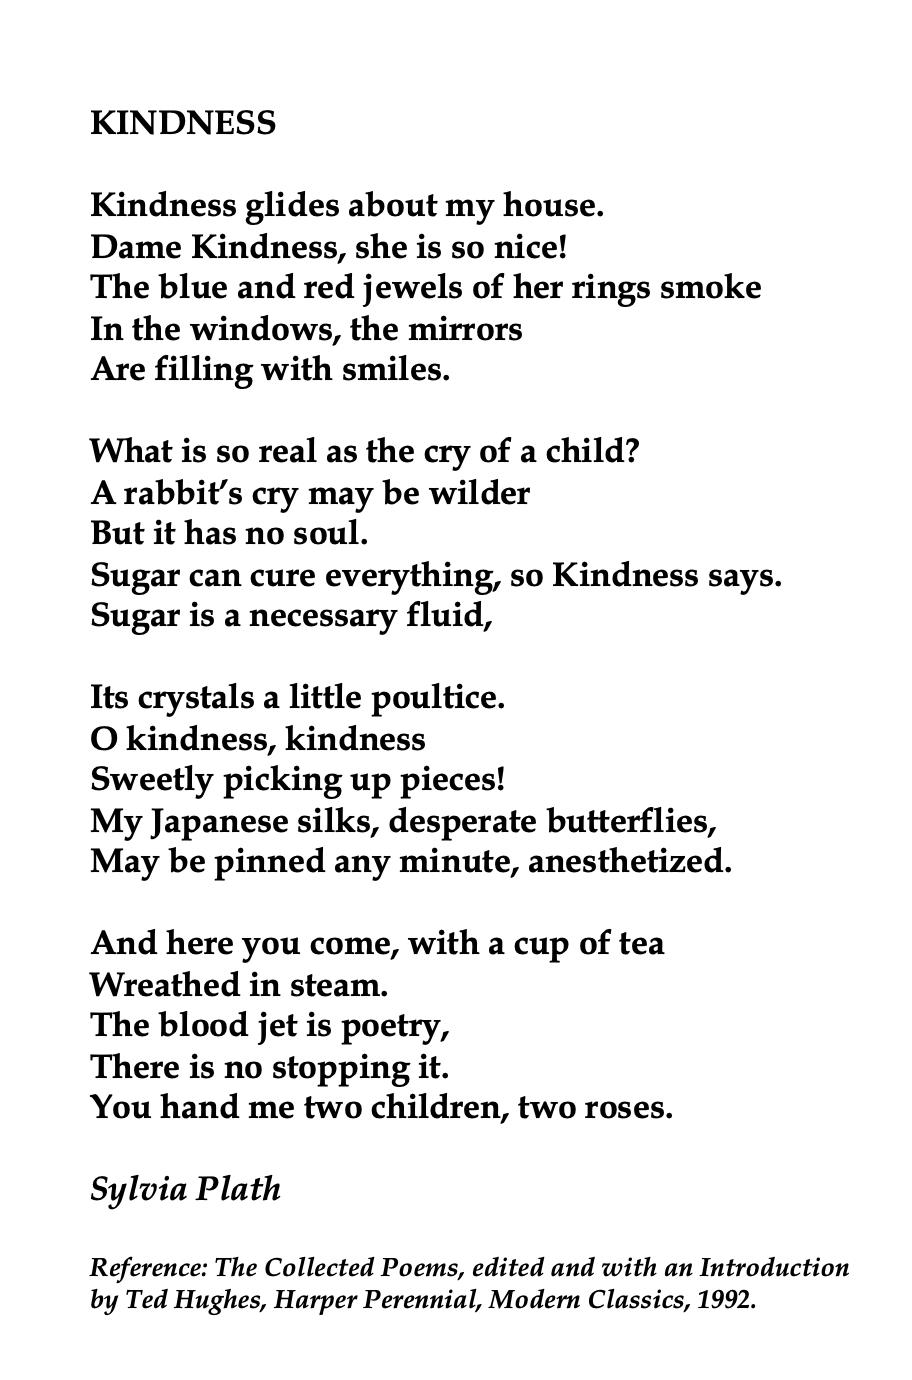 Sylvia Plath Kindnes Poem Poetry Ideas Paraphrase Of The Mirror By